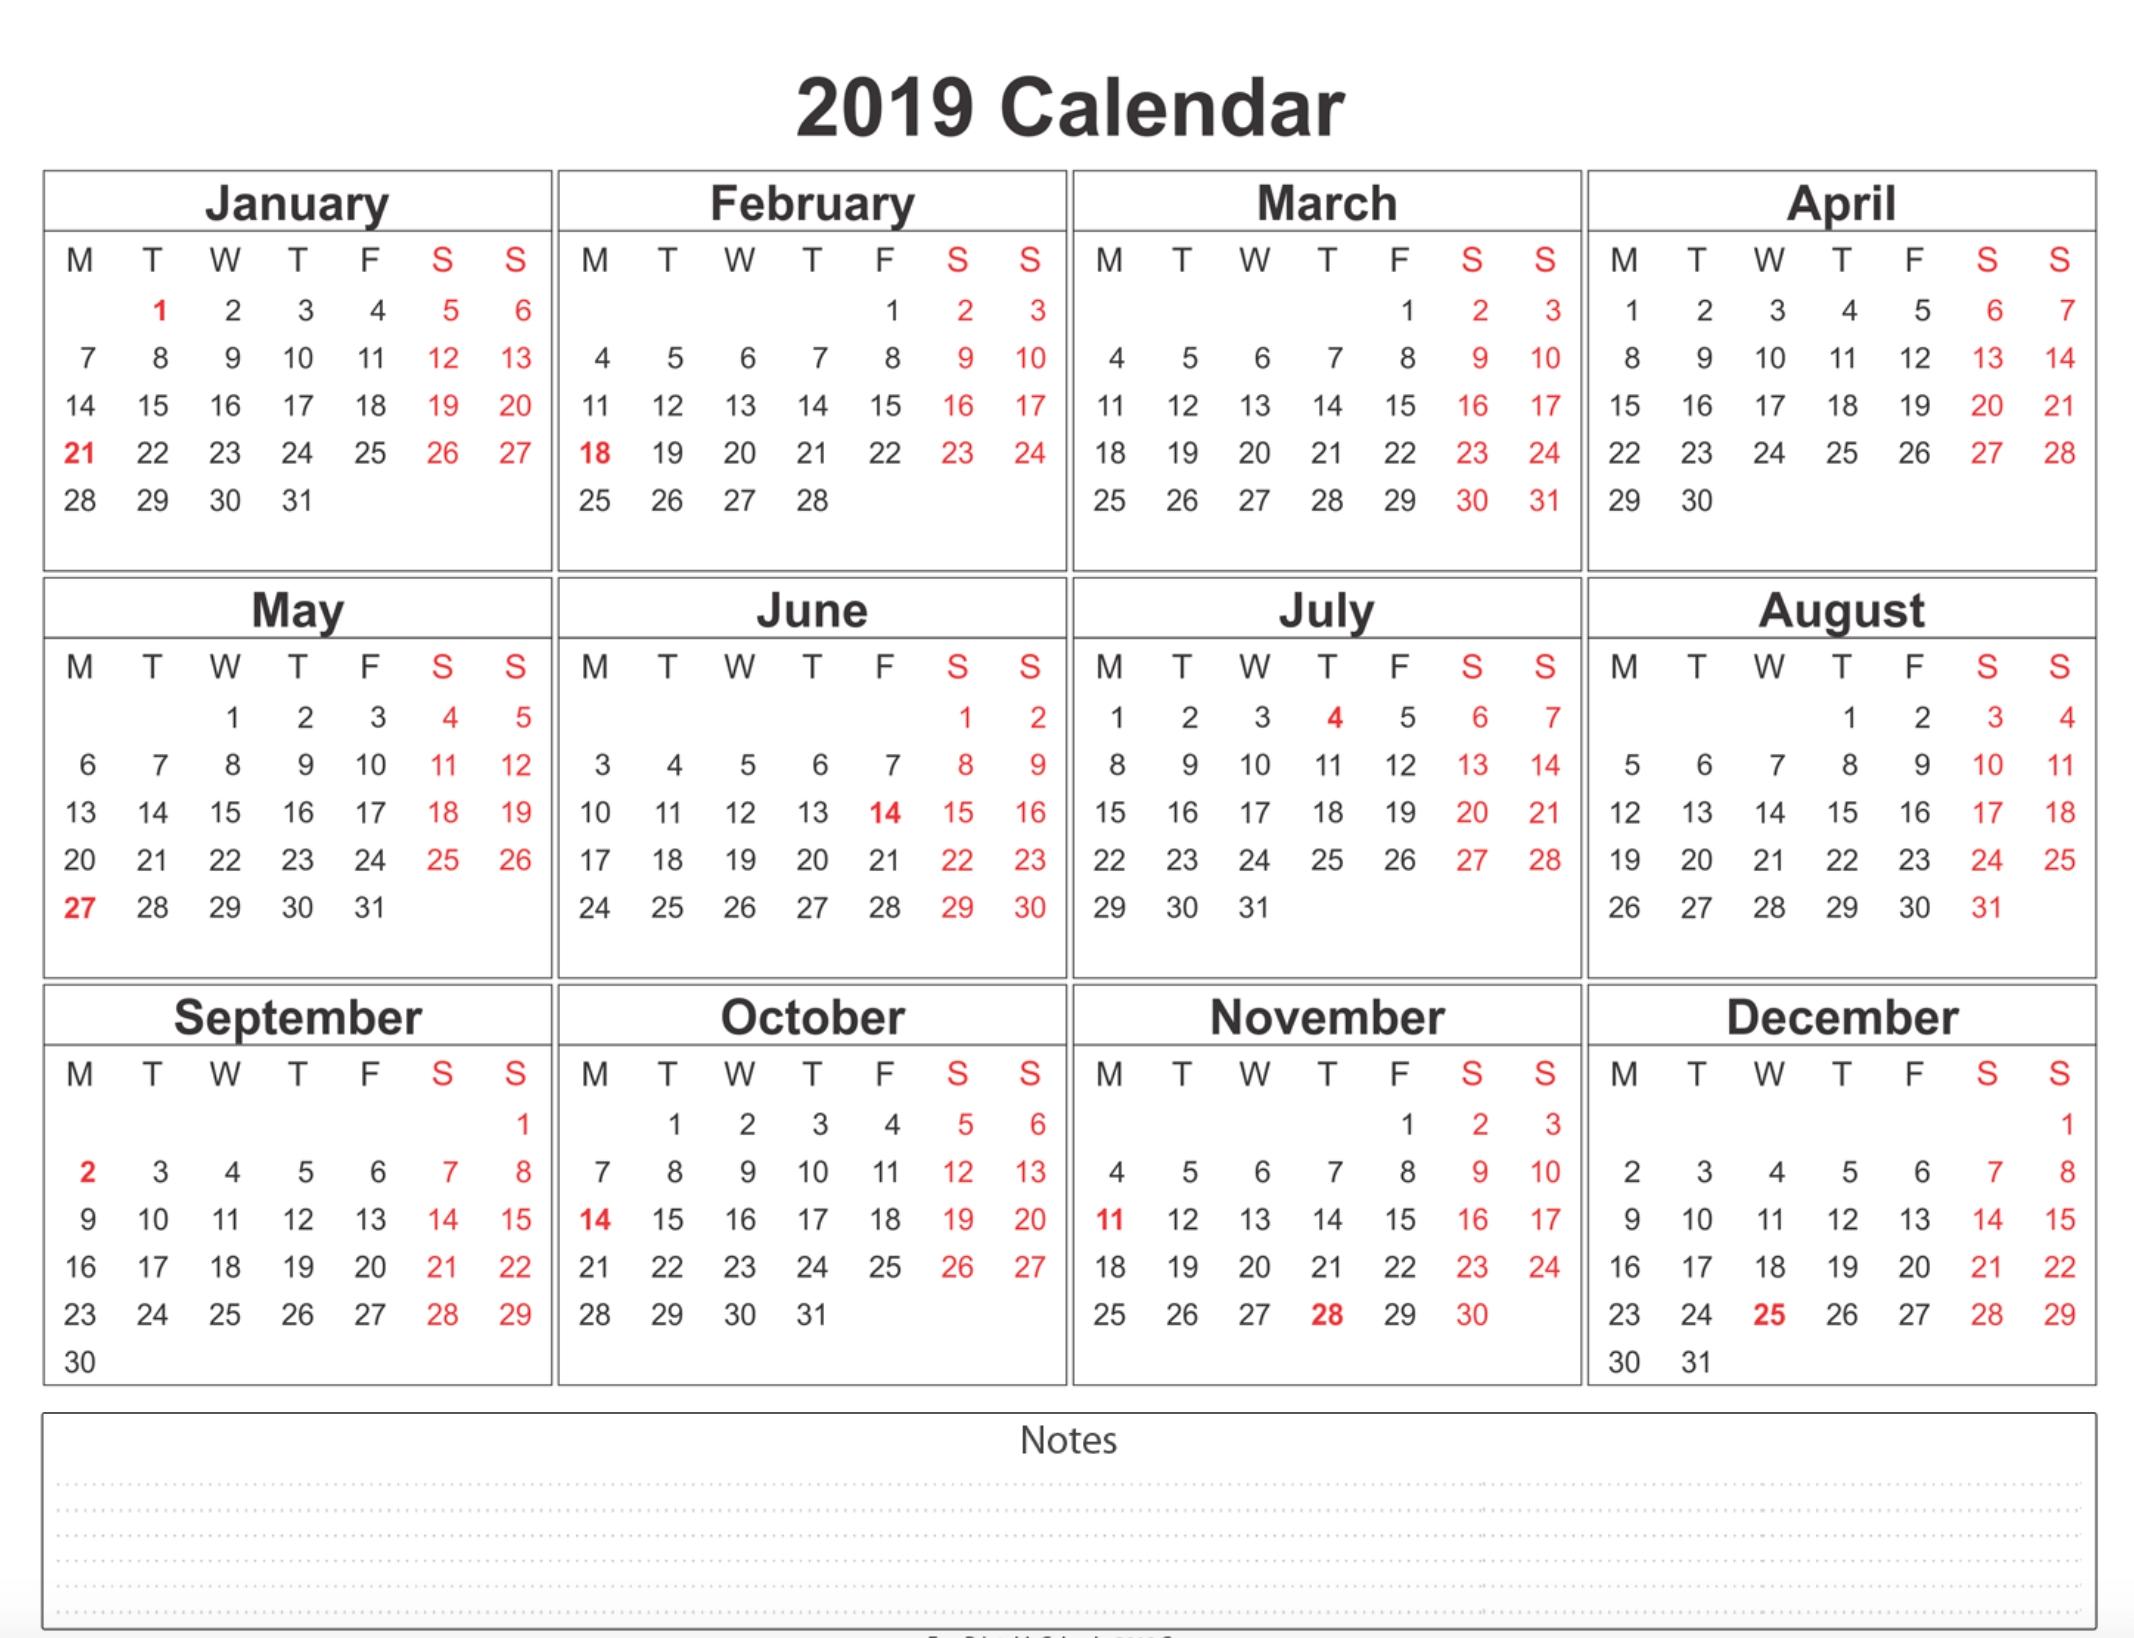 Free Printable 2019 Calendar Template